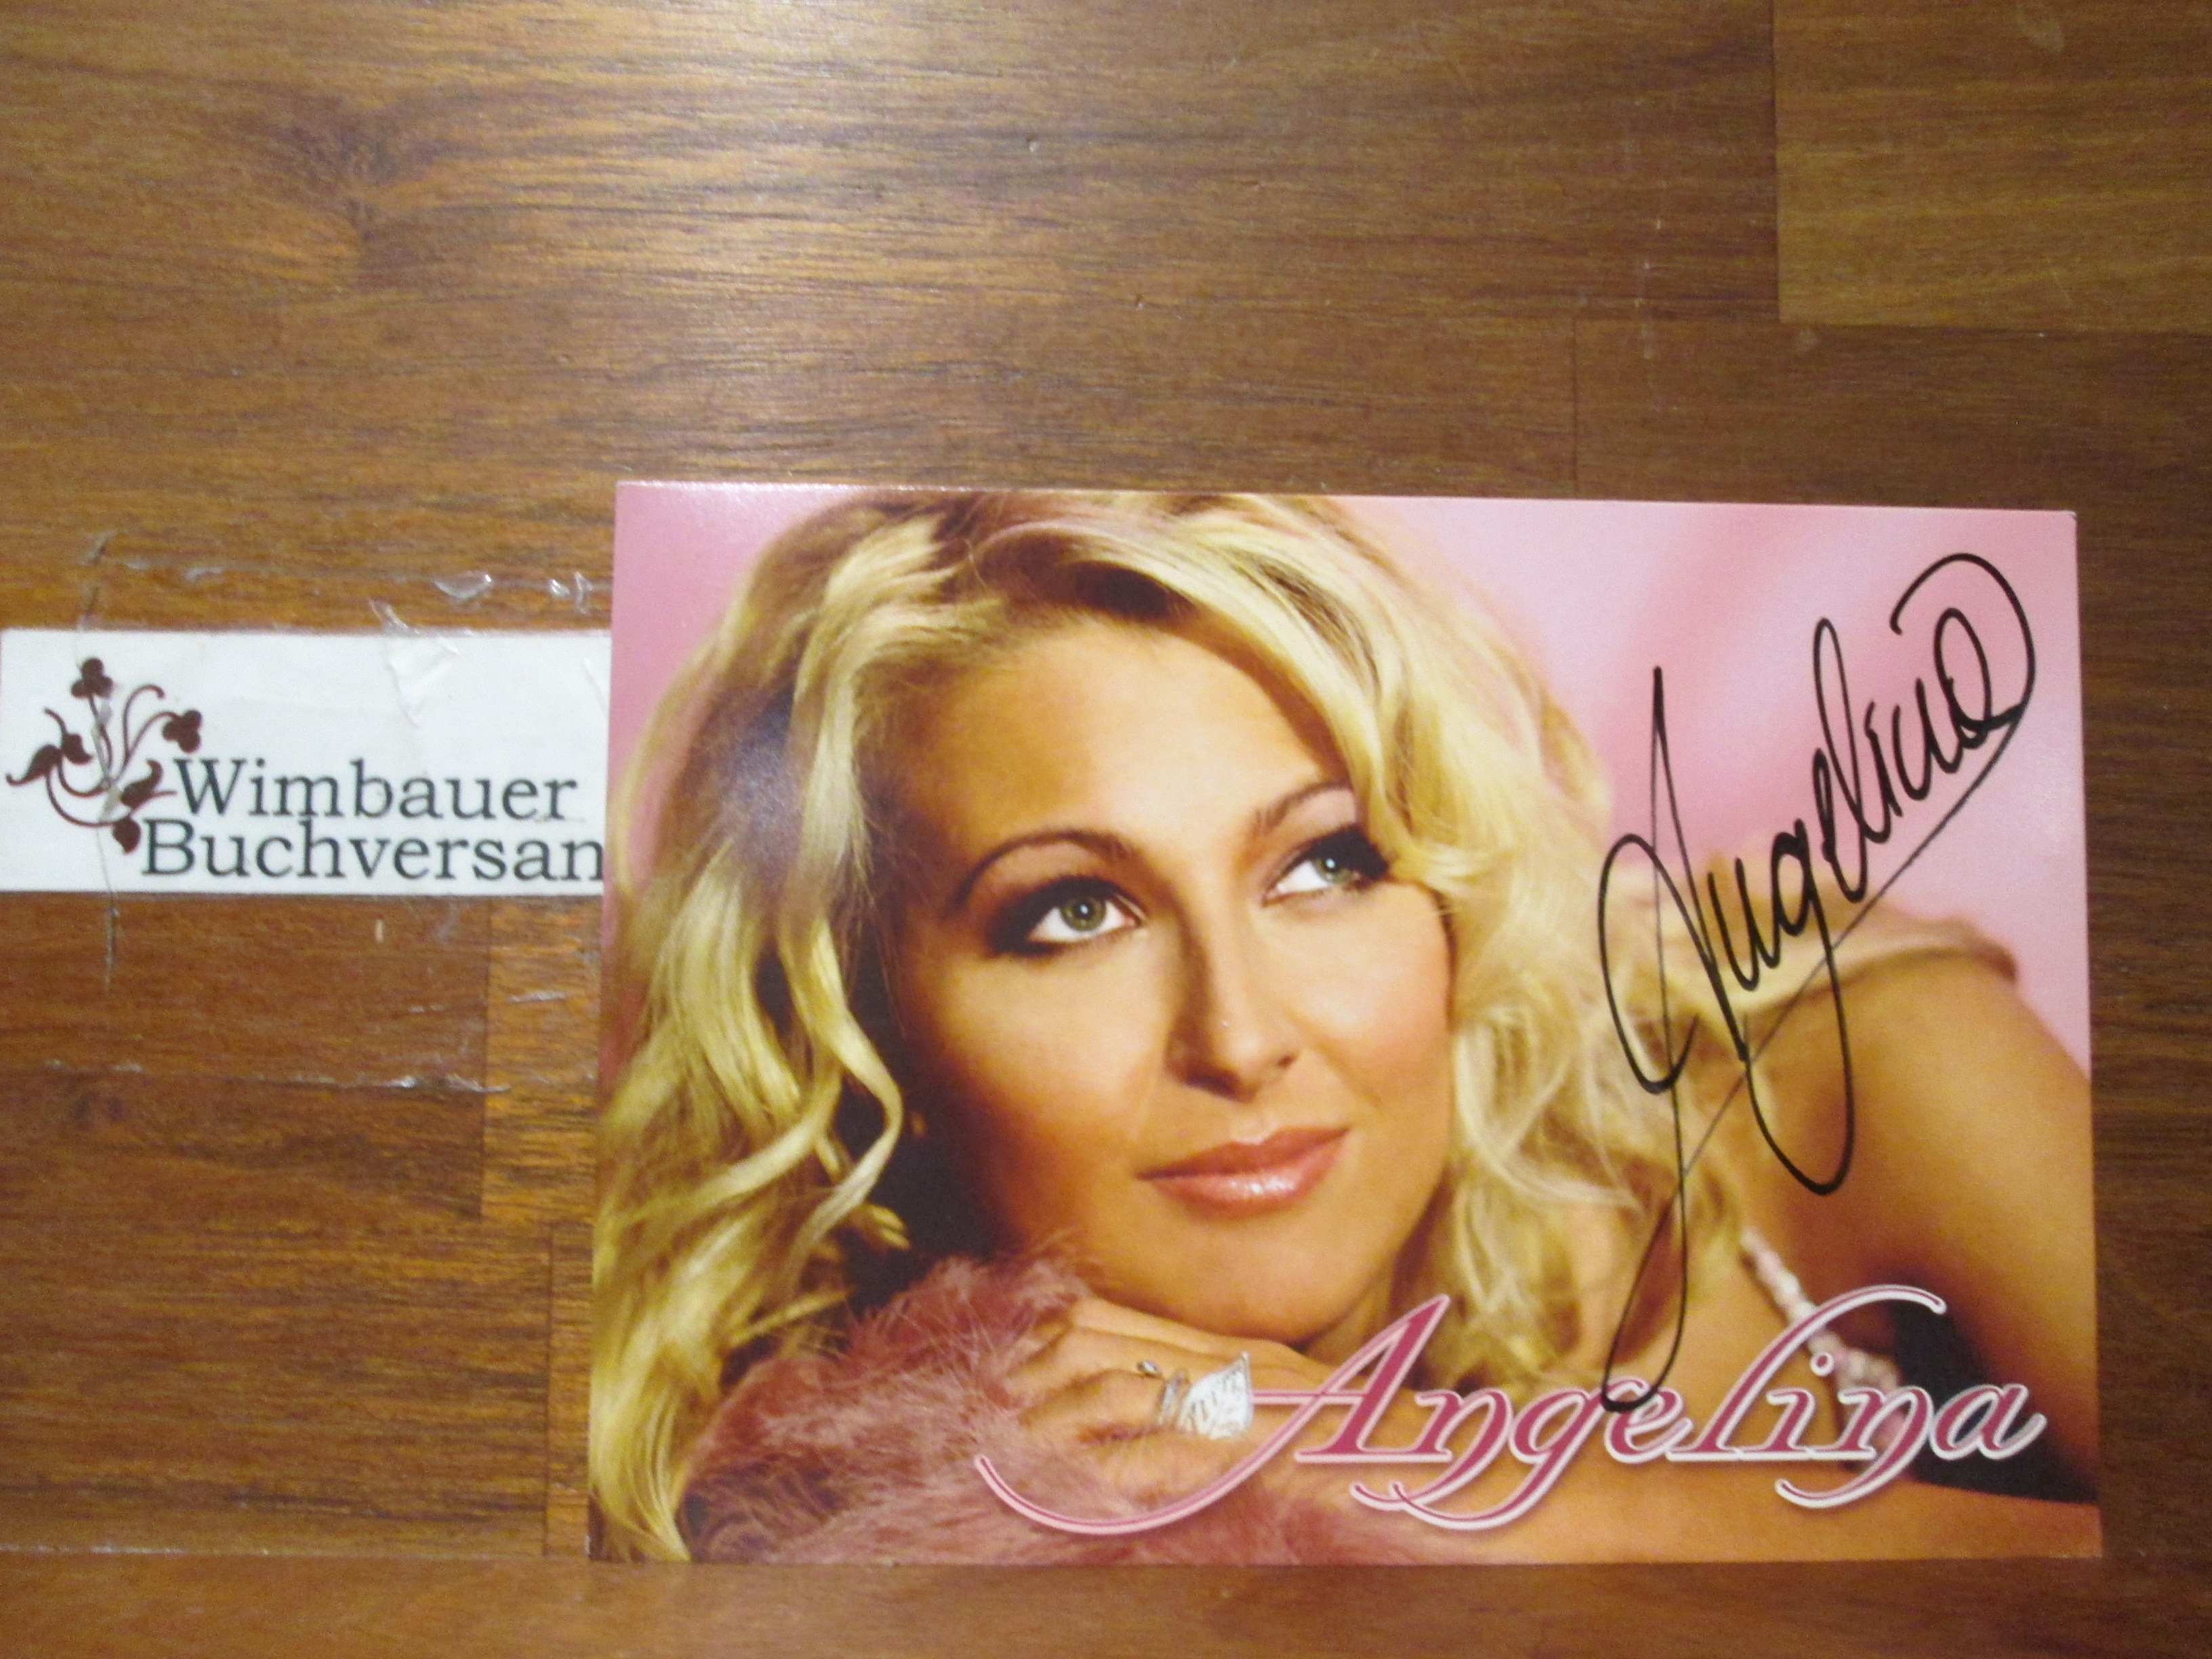 Original Autogramm Angelina /// Autogramm Autograph signiert signed signee